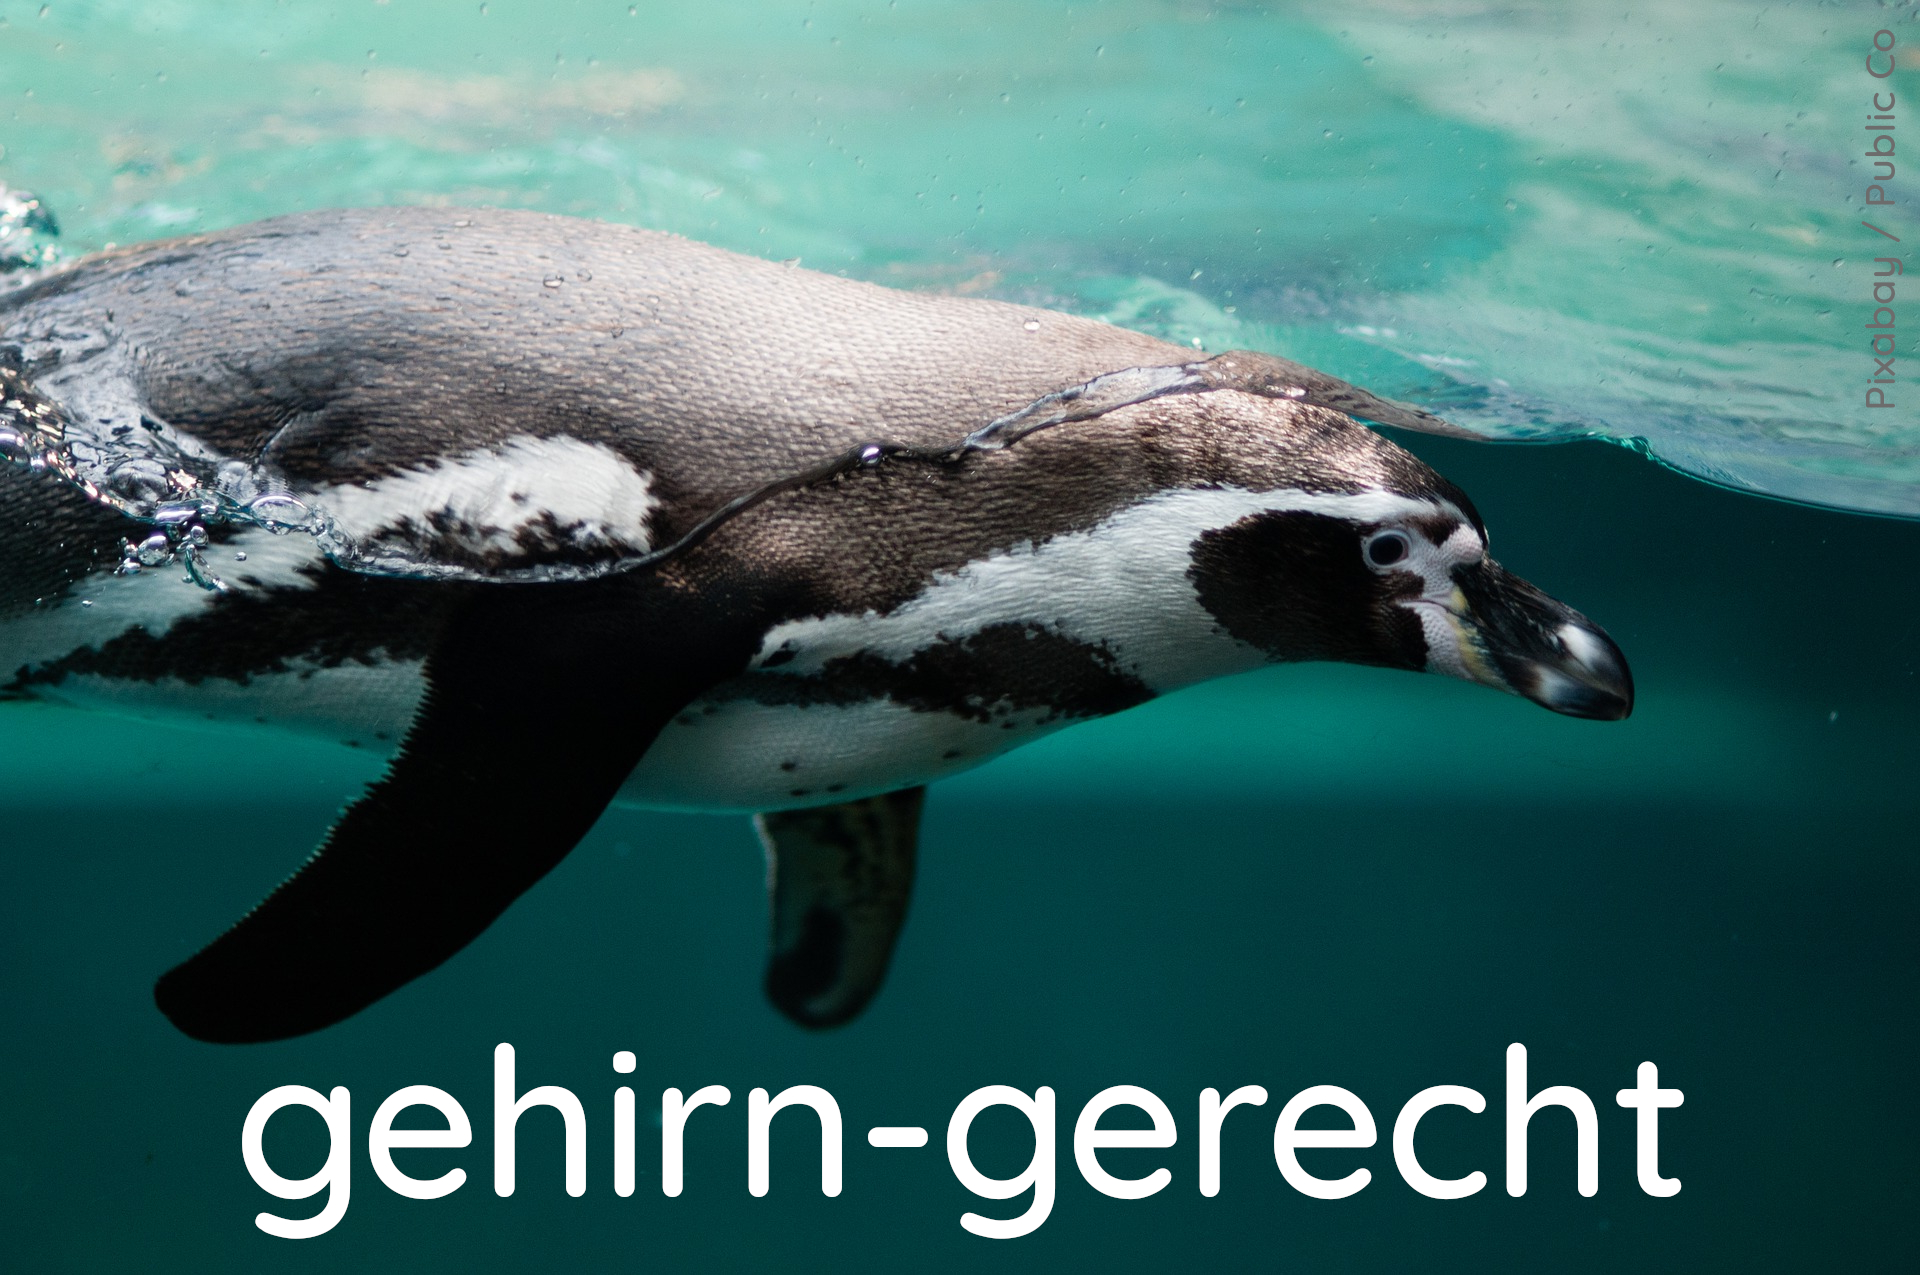 Pinguin Element gehirn-gerecht Quelle